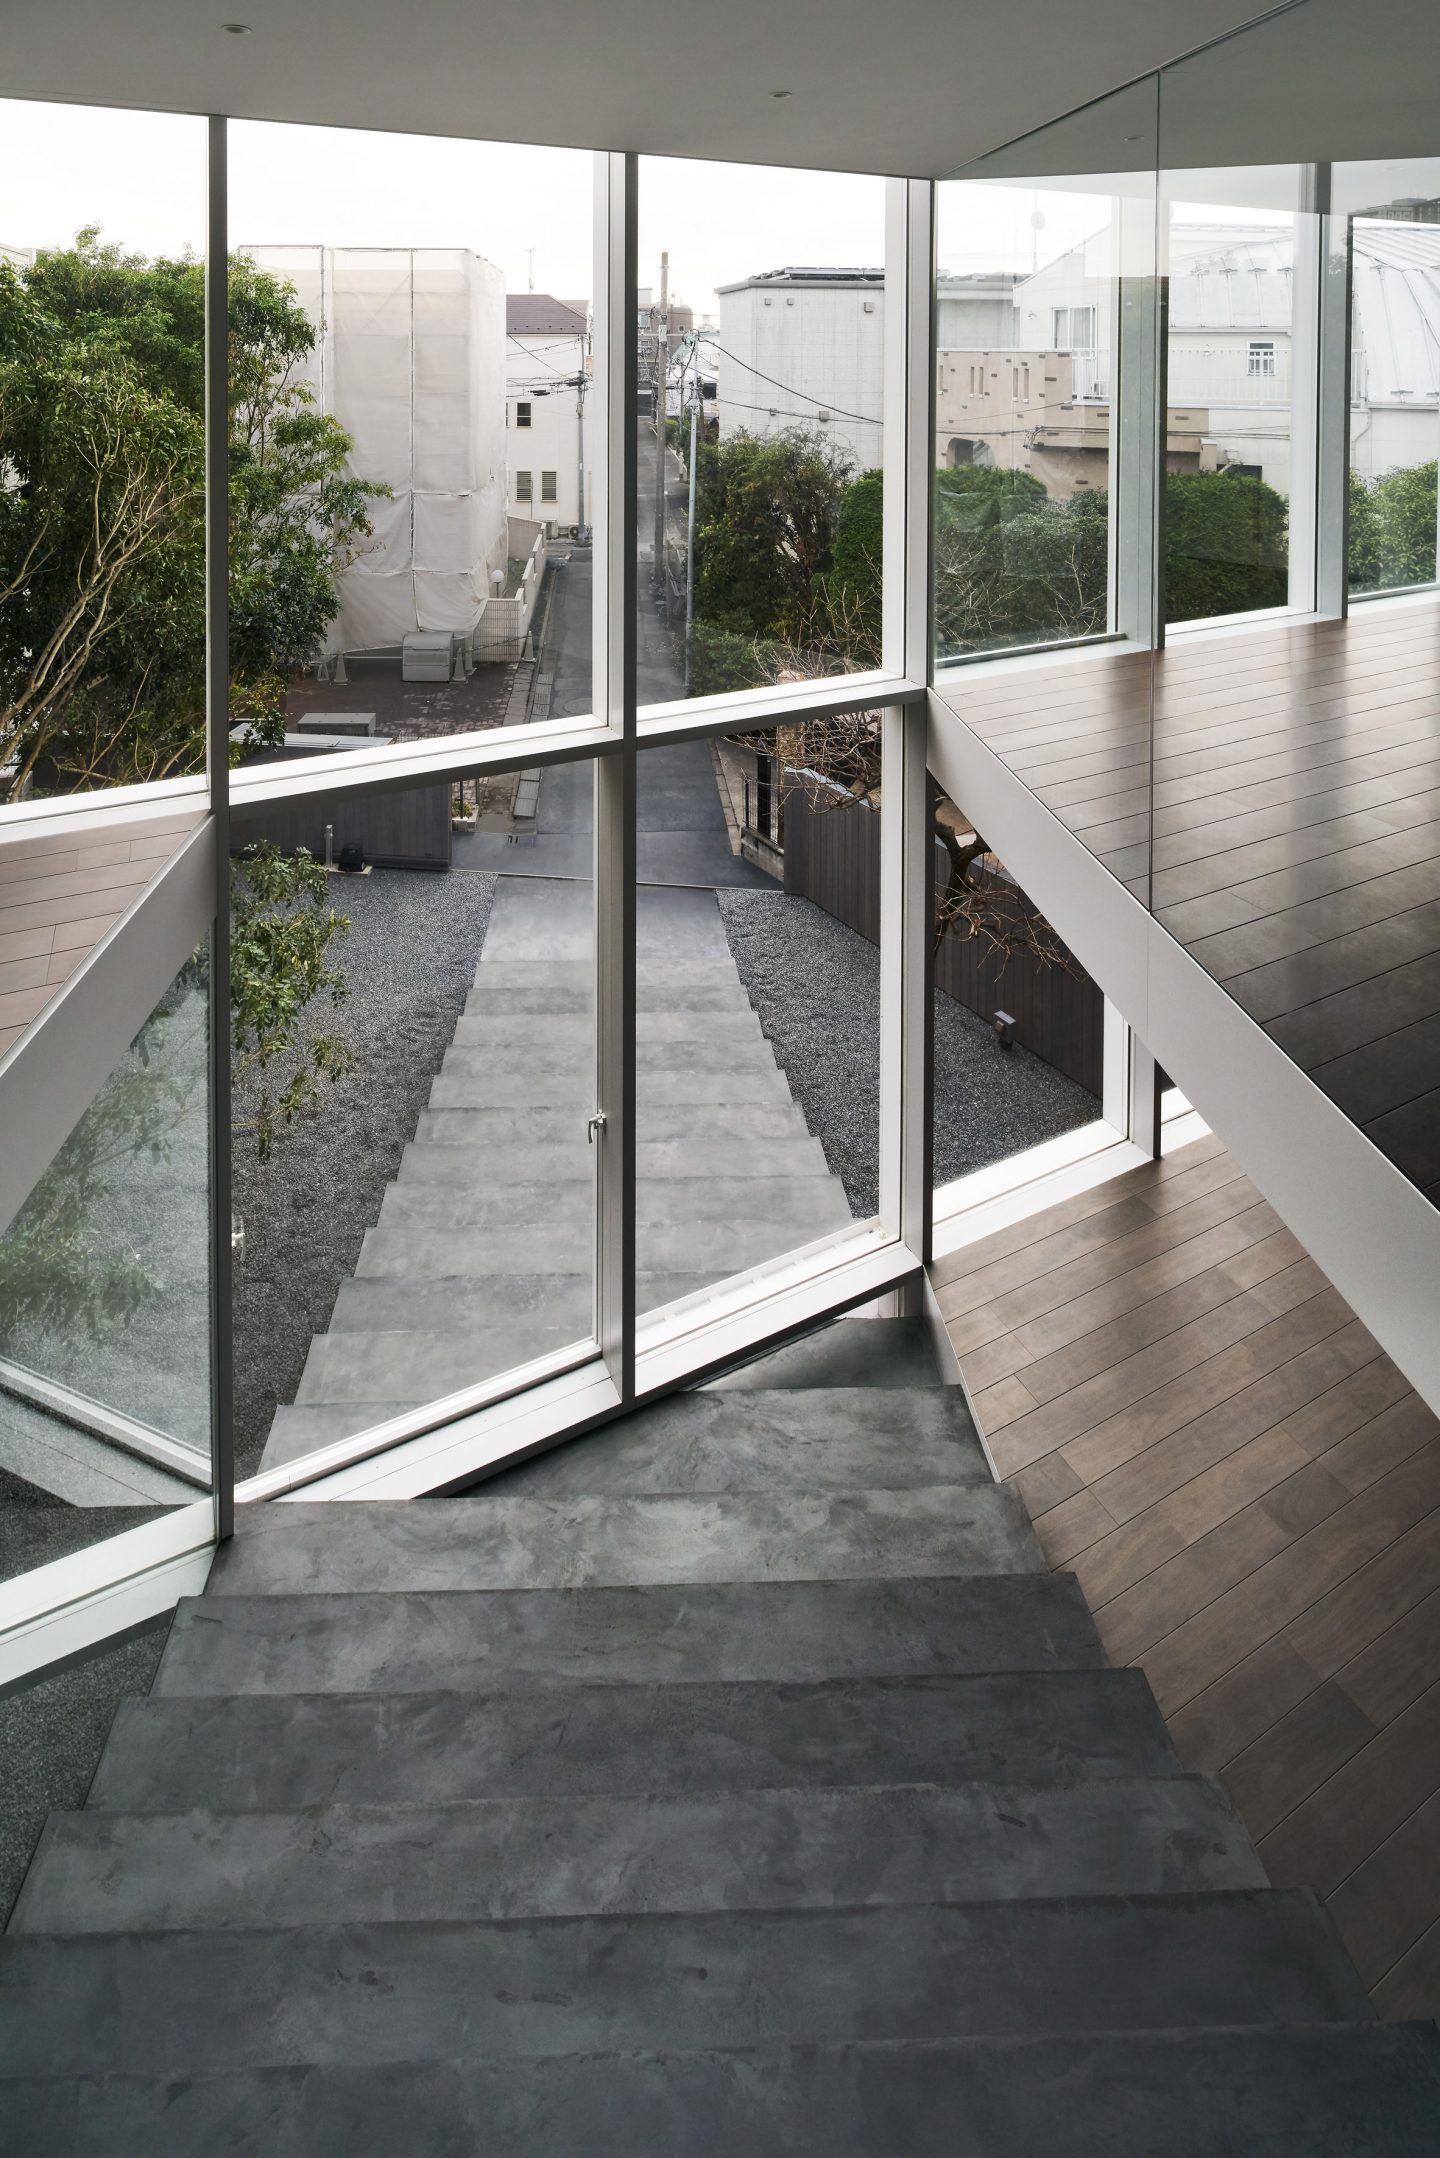 IGNANT-Architecture-Nendo-Stairway-House-04